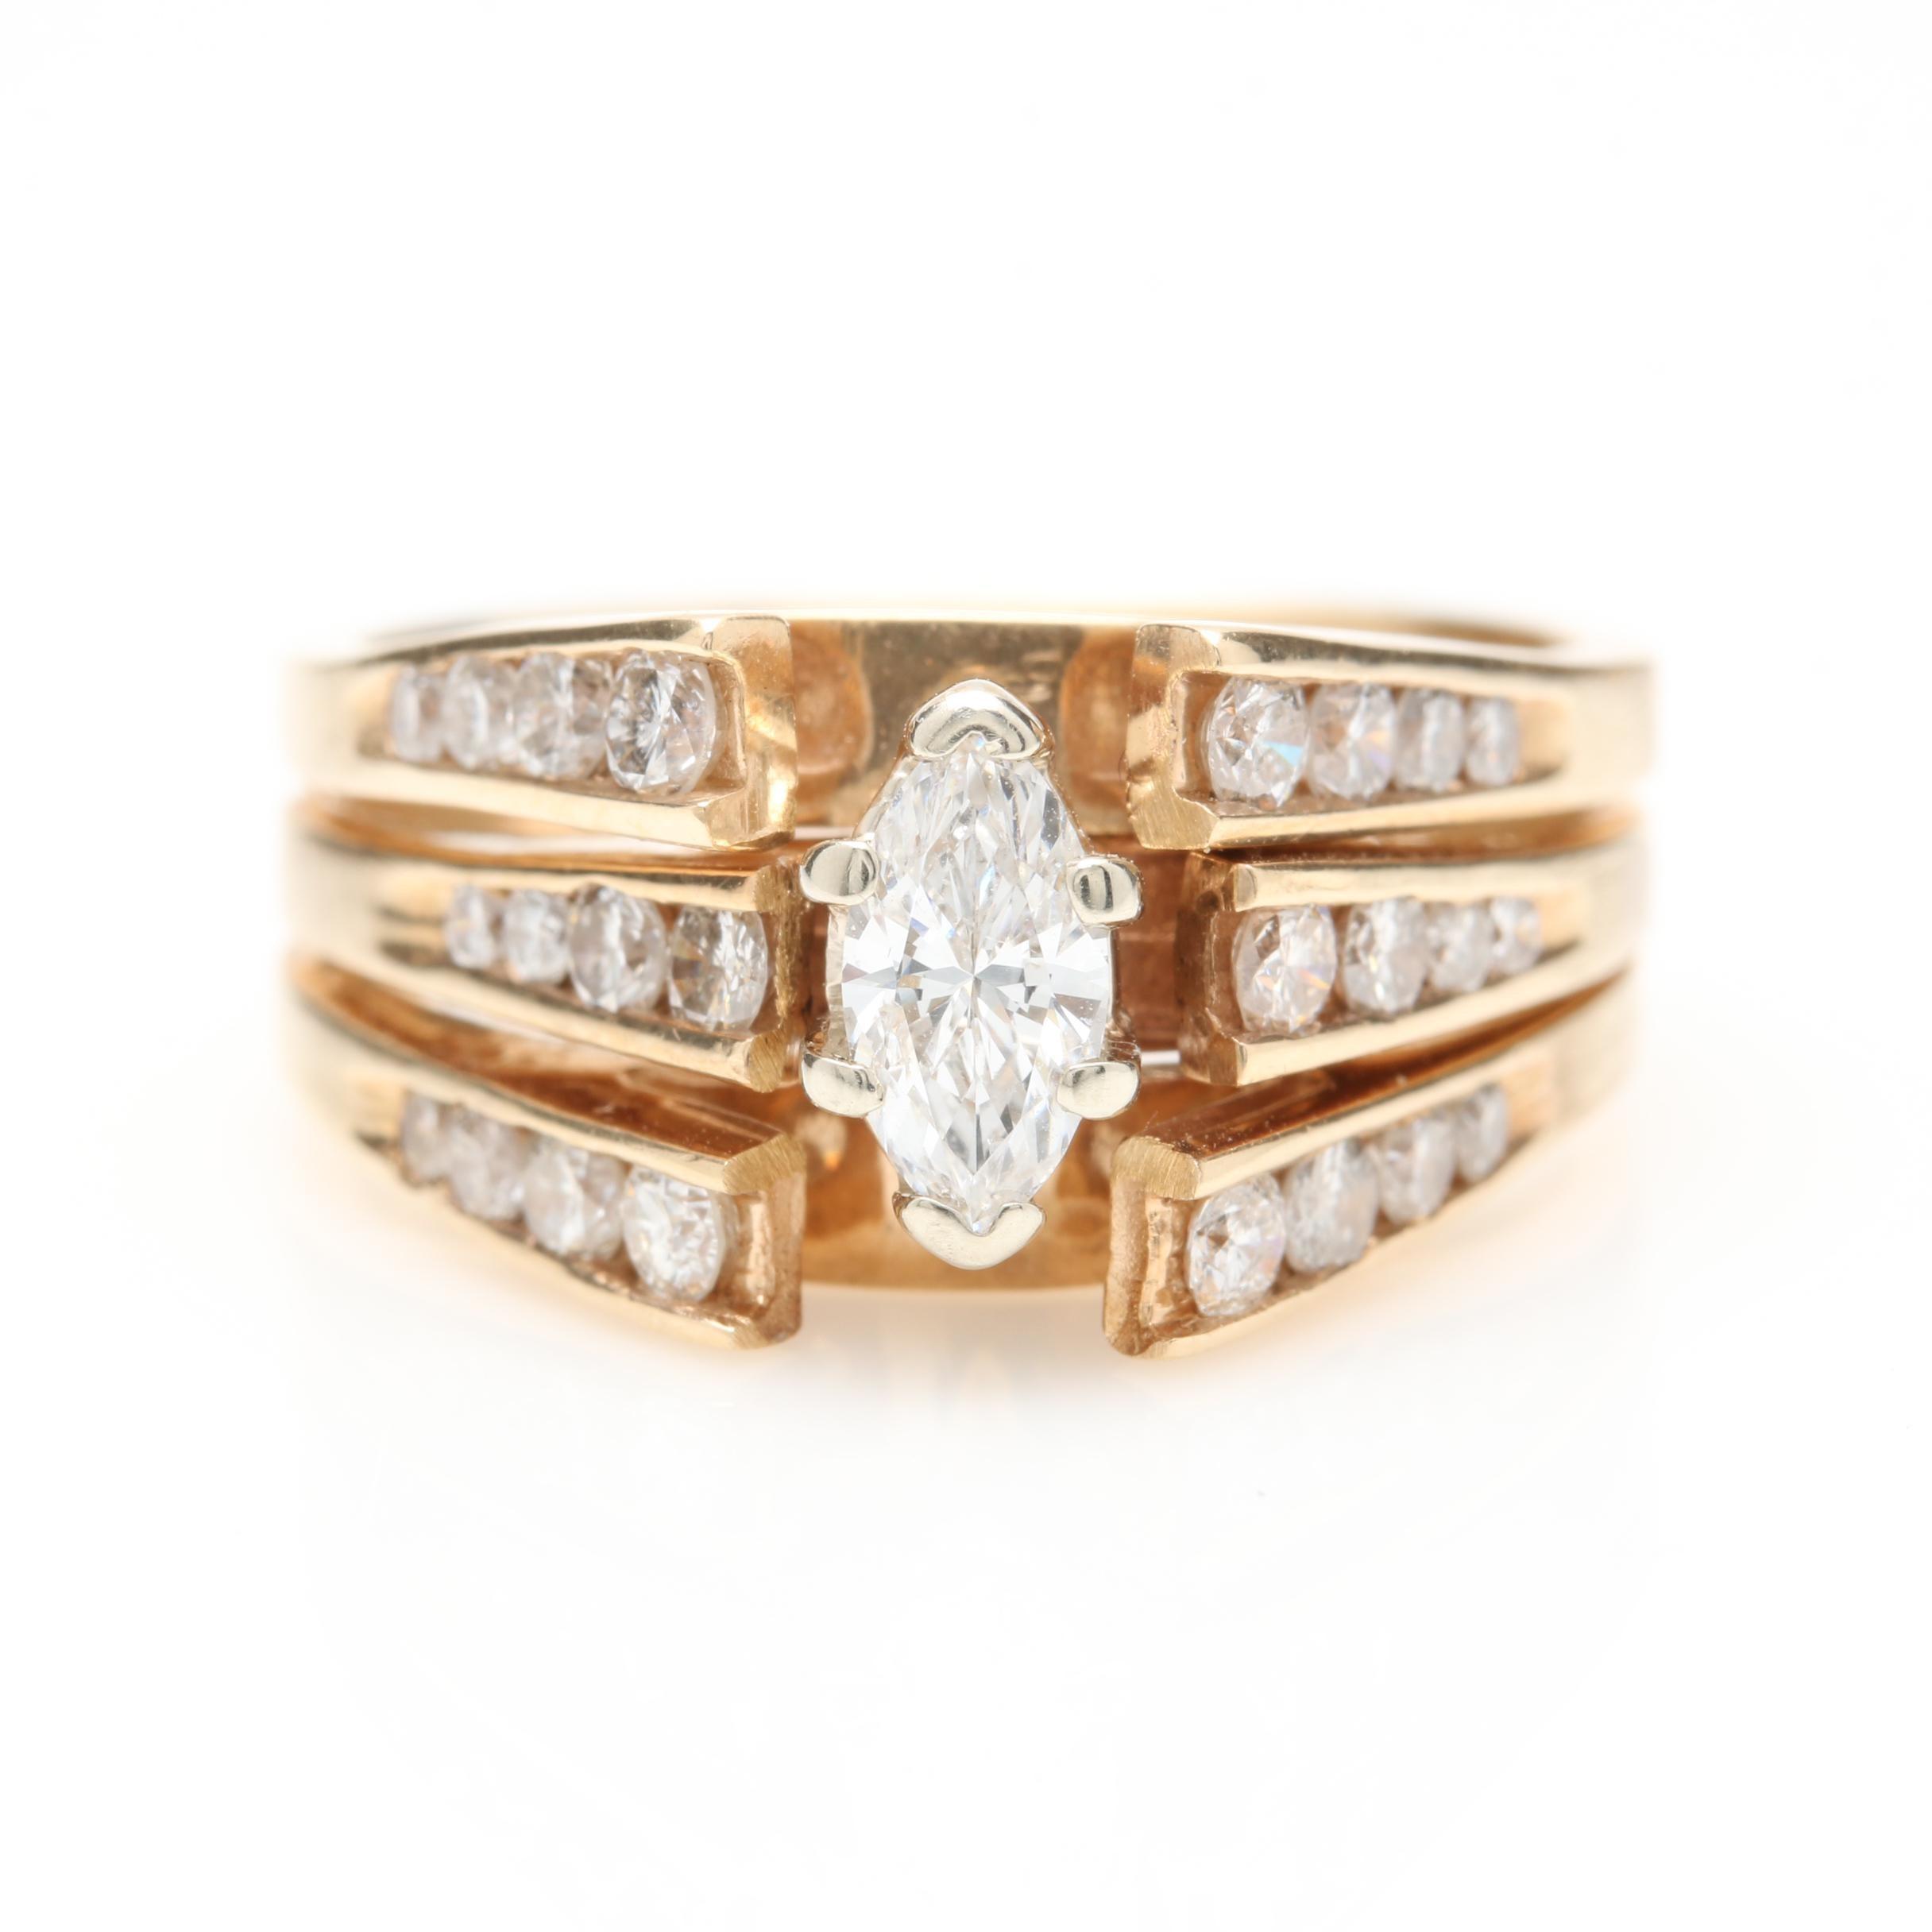 14K Yellow Gold 1.10 CTW Diamond Ring